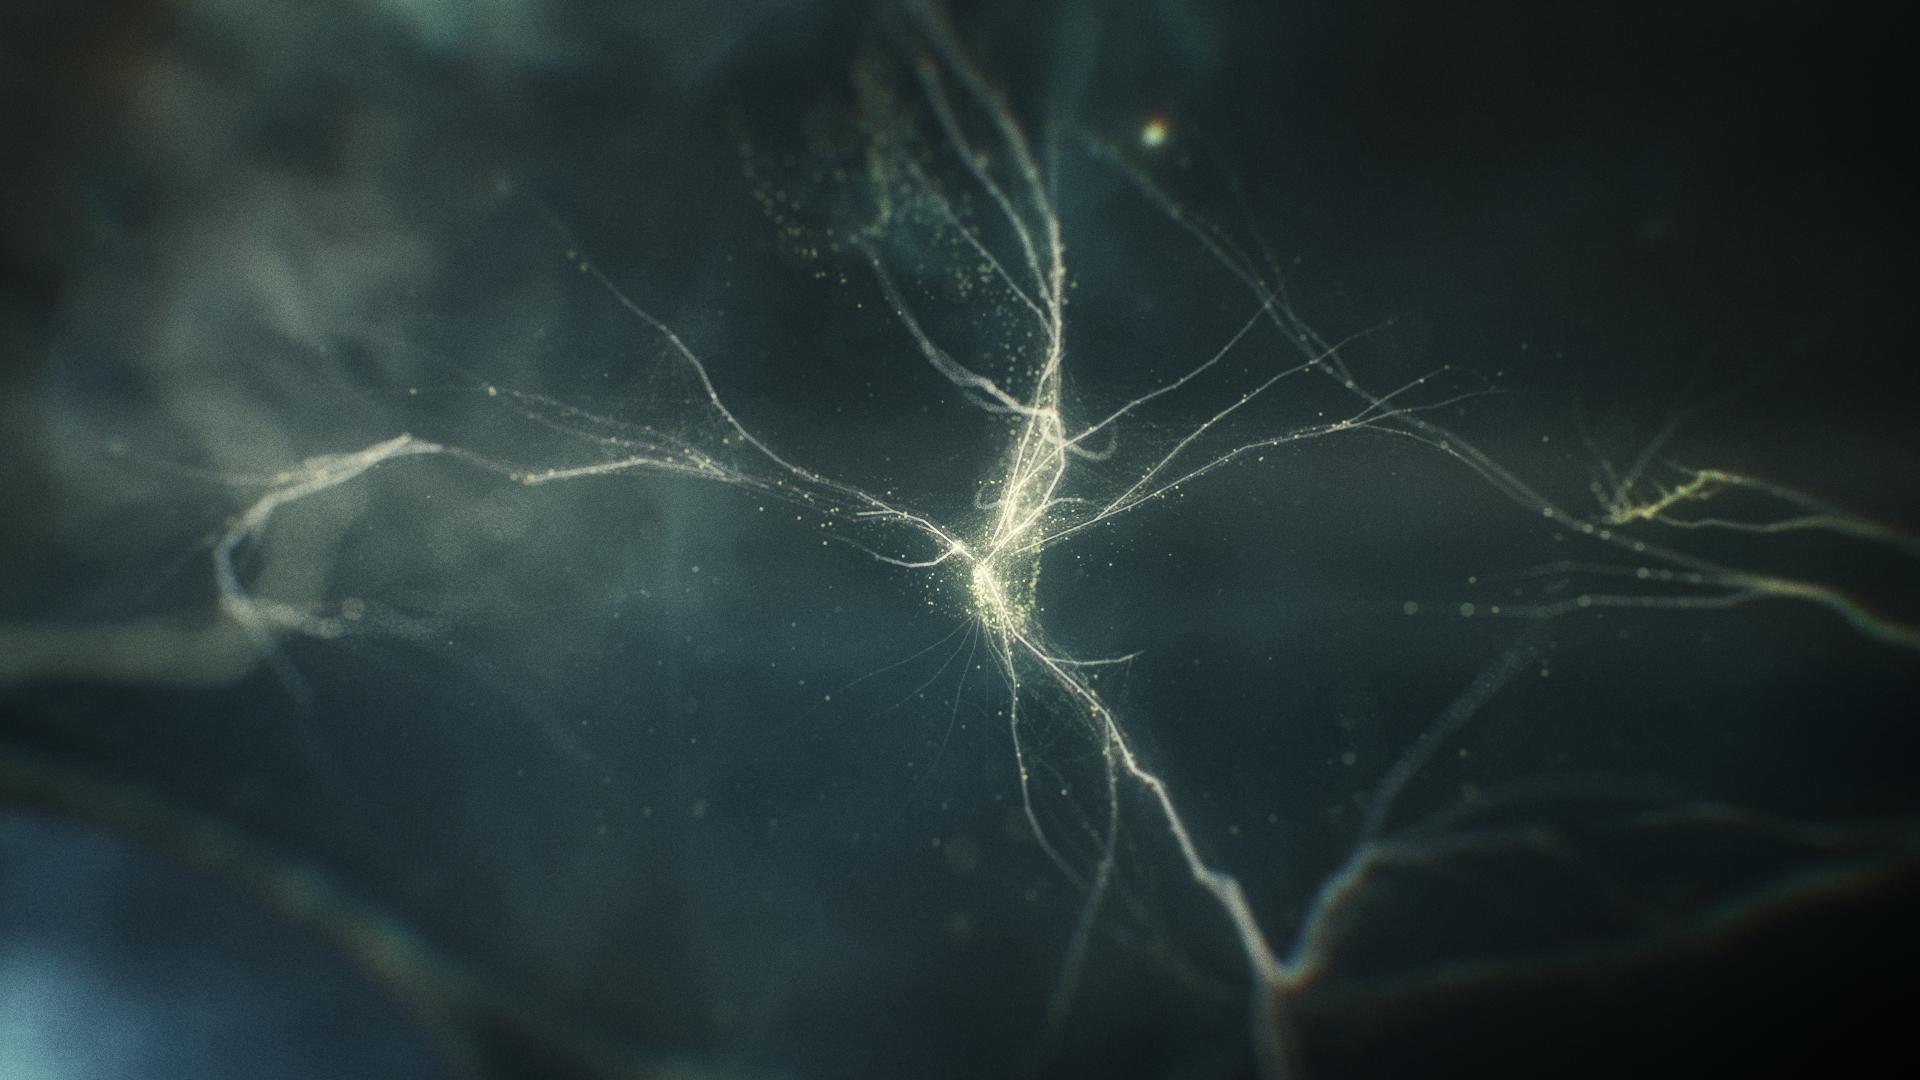 IDEO_Neuron_01_0001.jpg